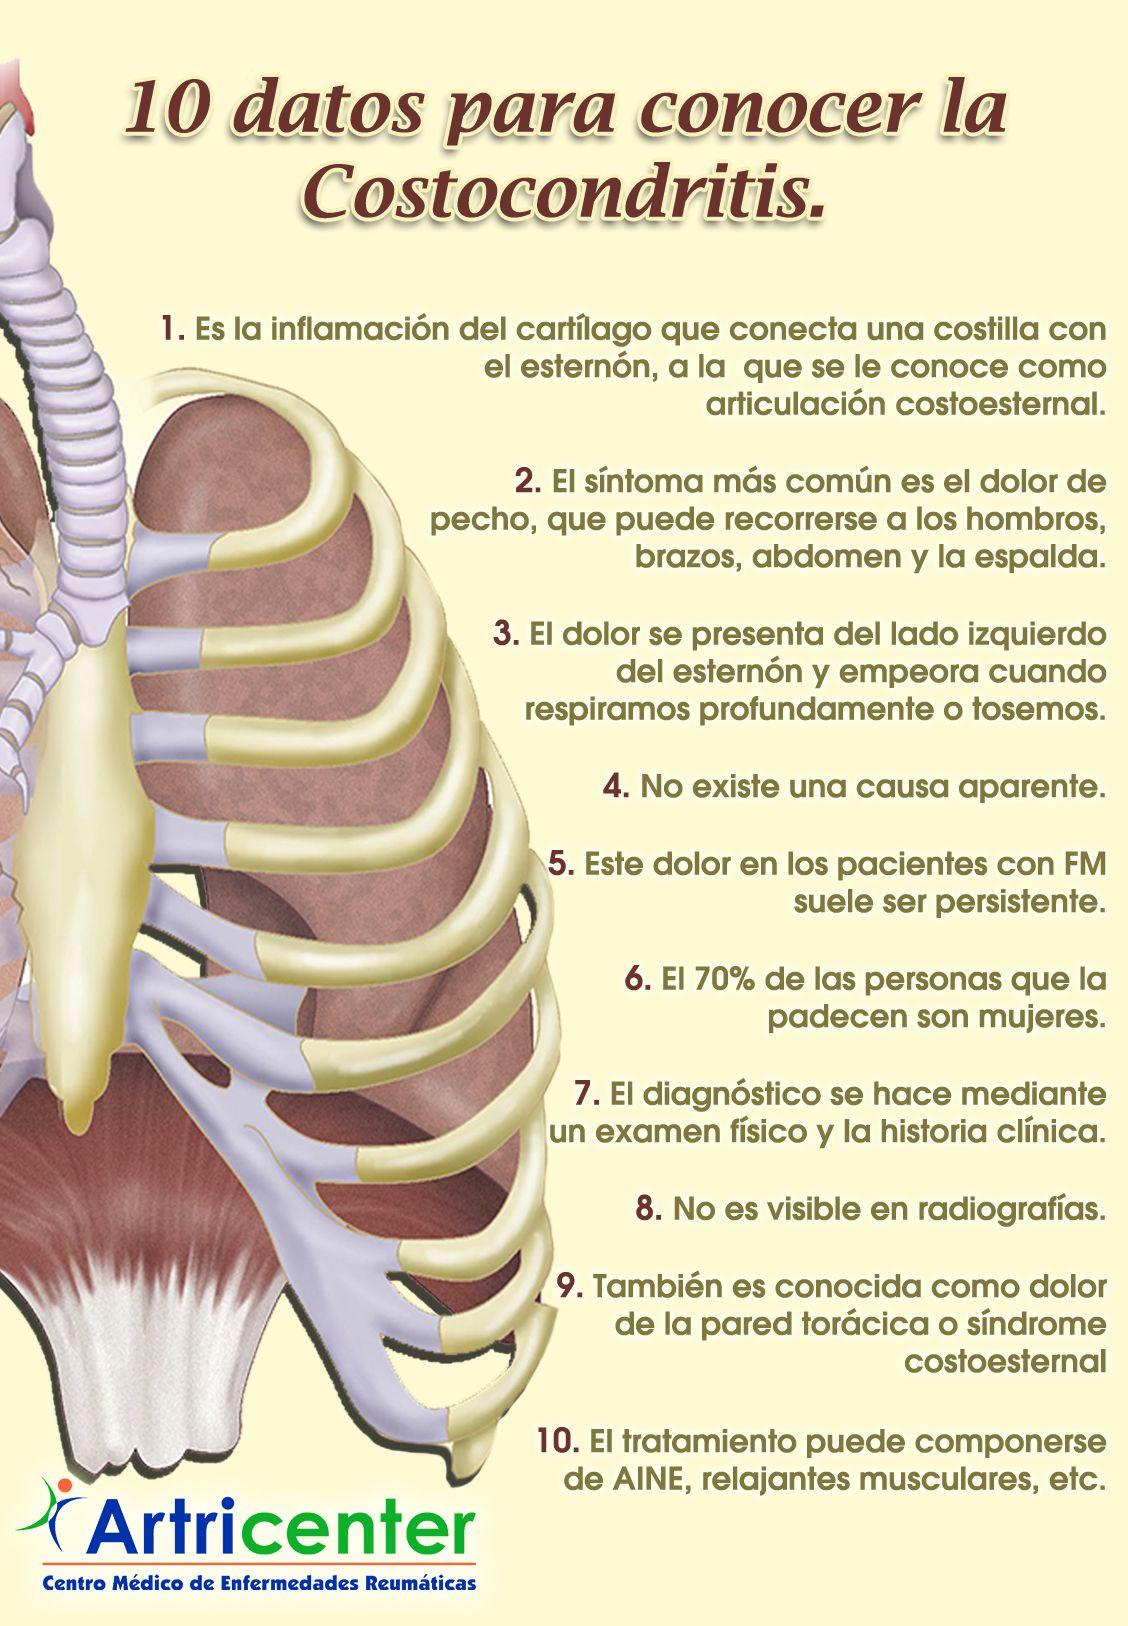 Conoce la Costocondritis en 10 datos | Pinterest | Fibromialgia ...